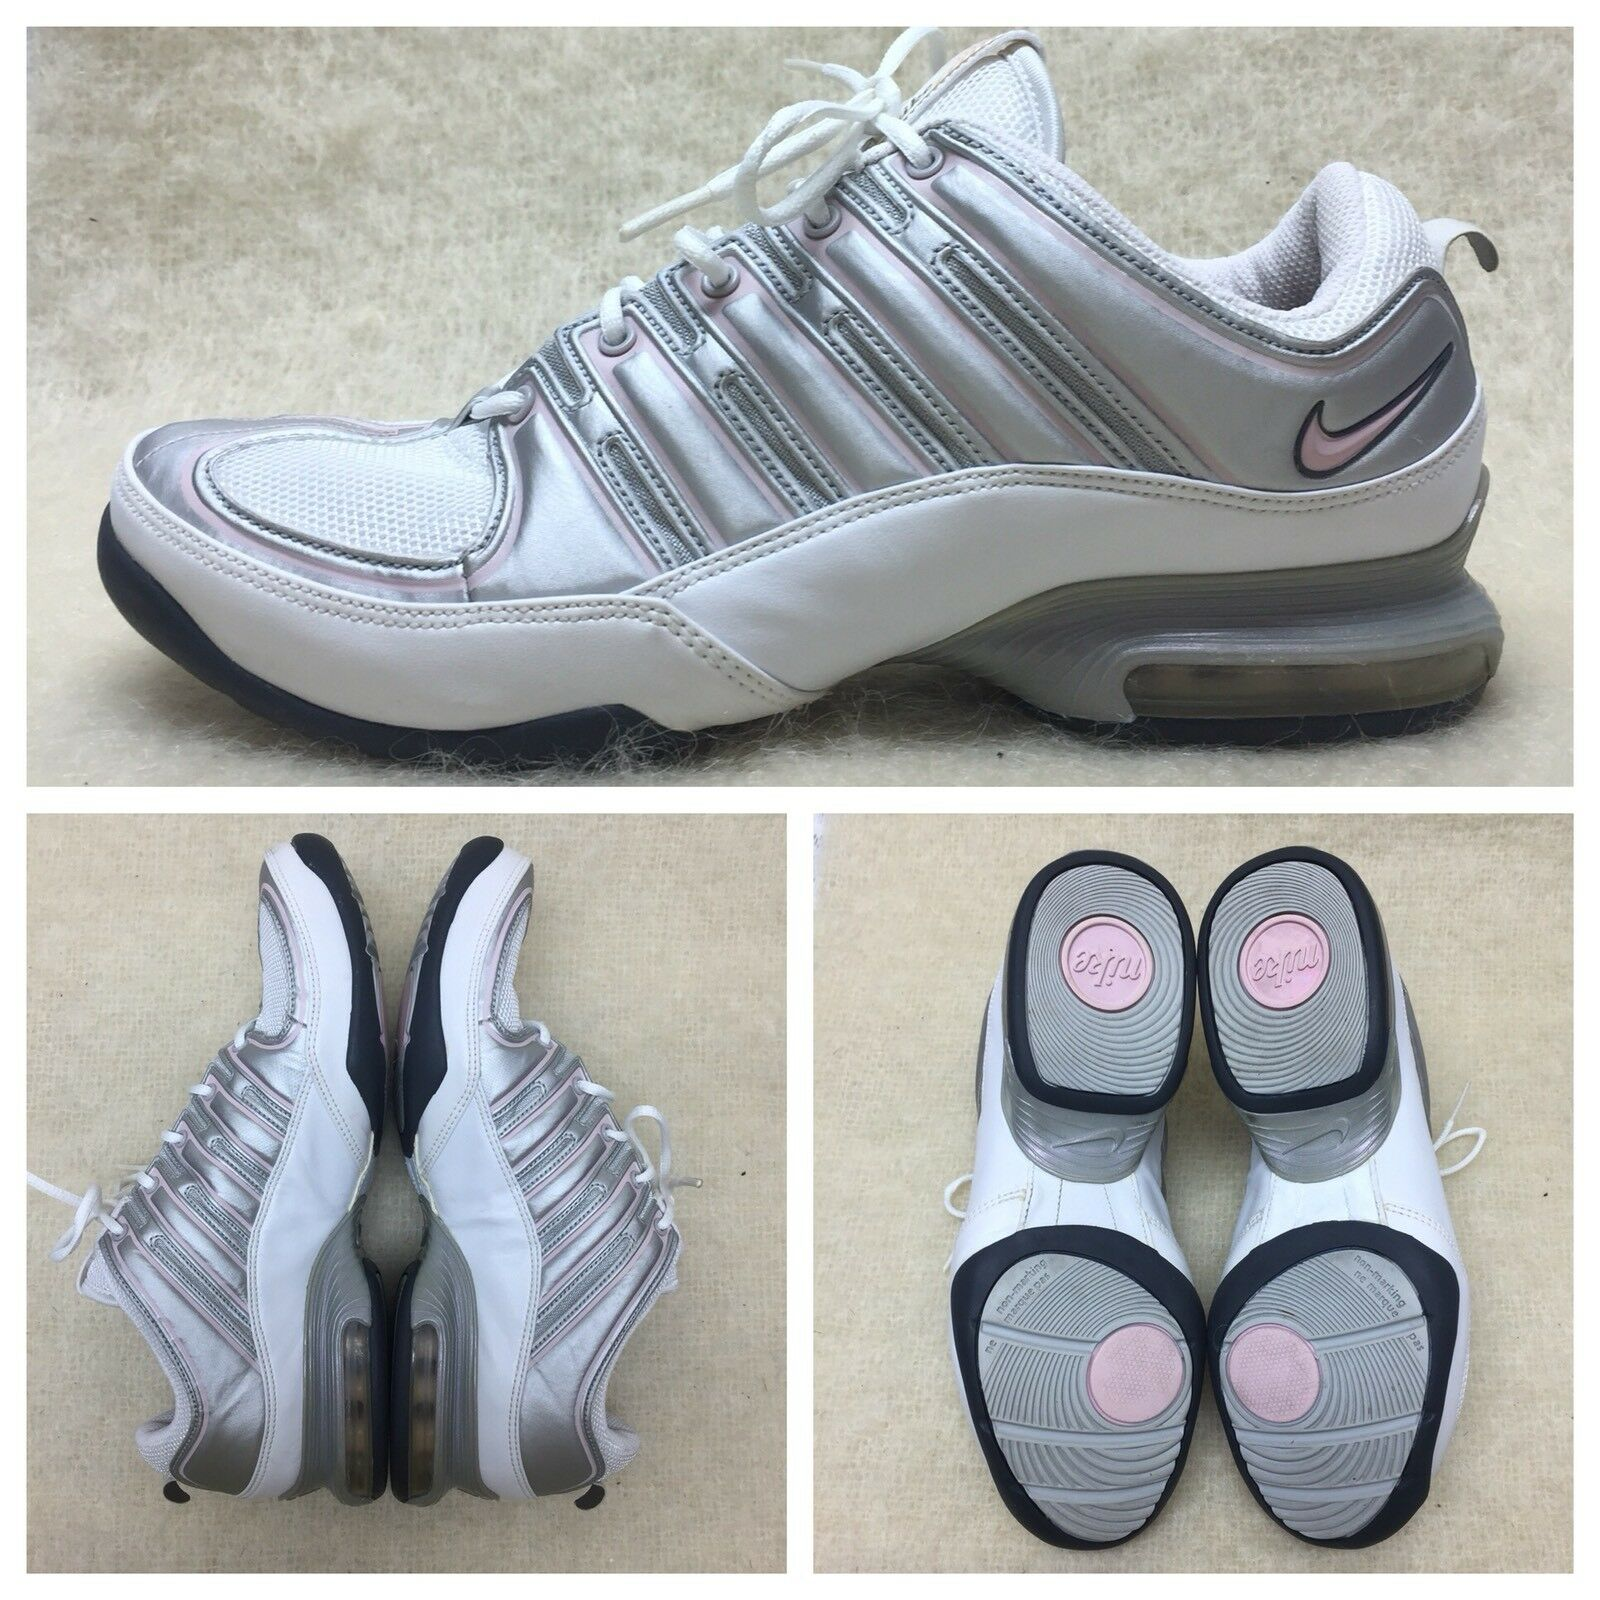 Nike Max Air 313945-161 women size 9 White Silver Pink